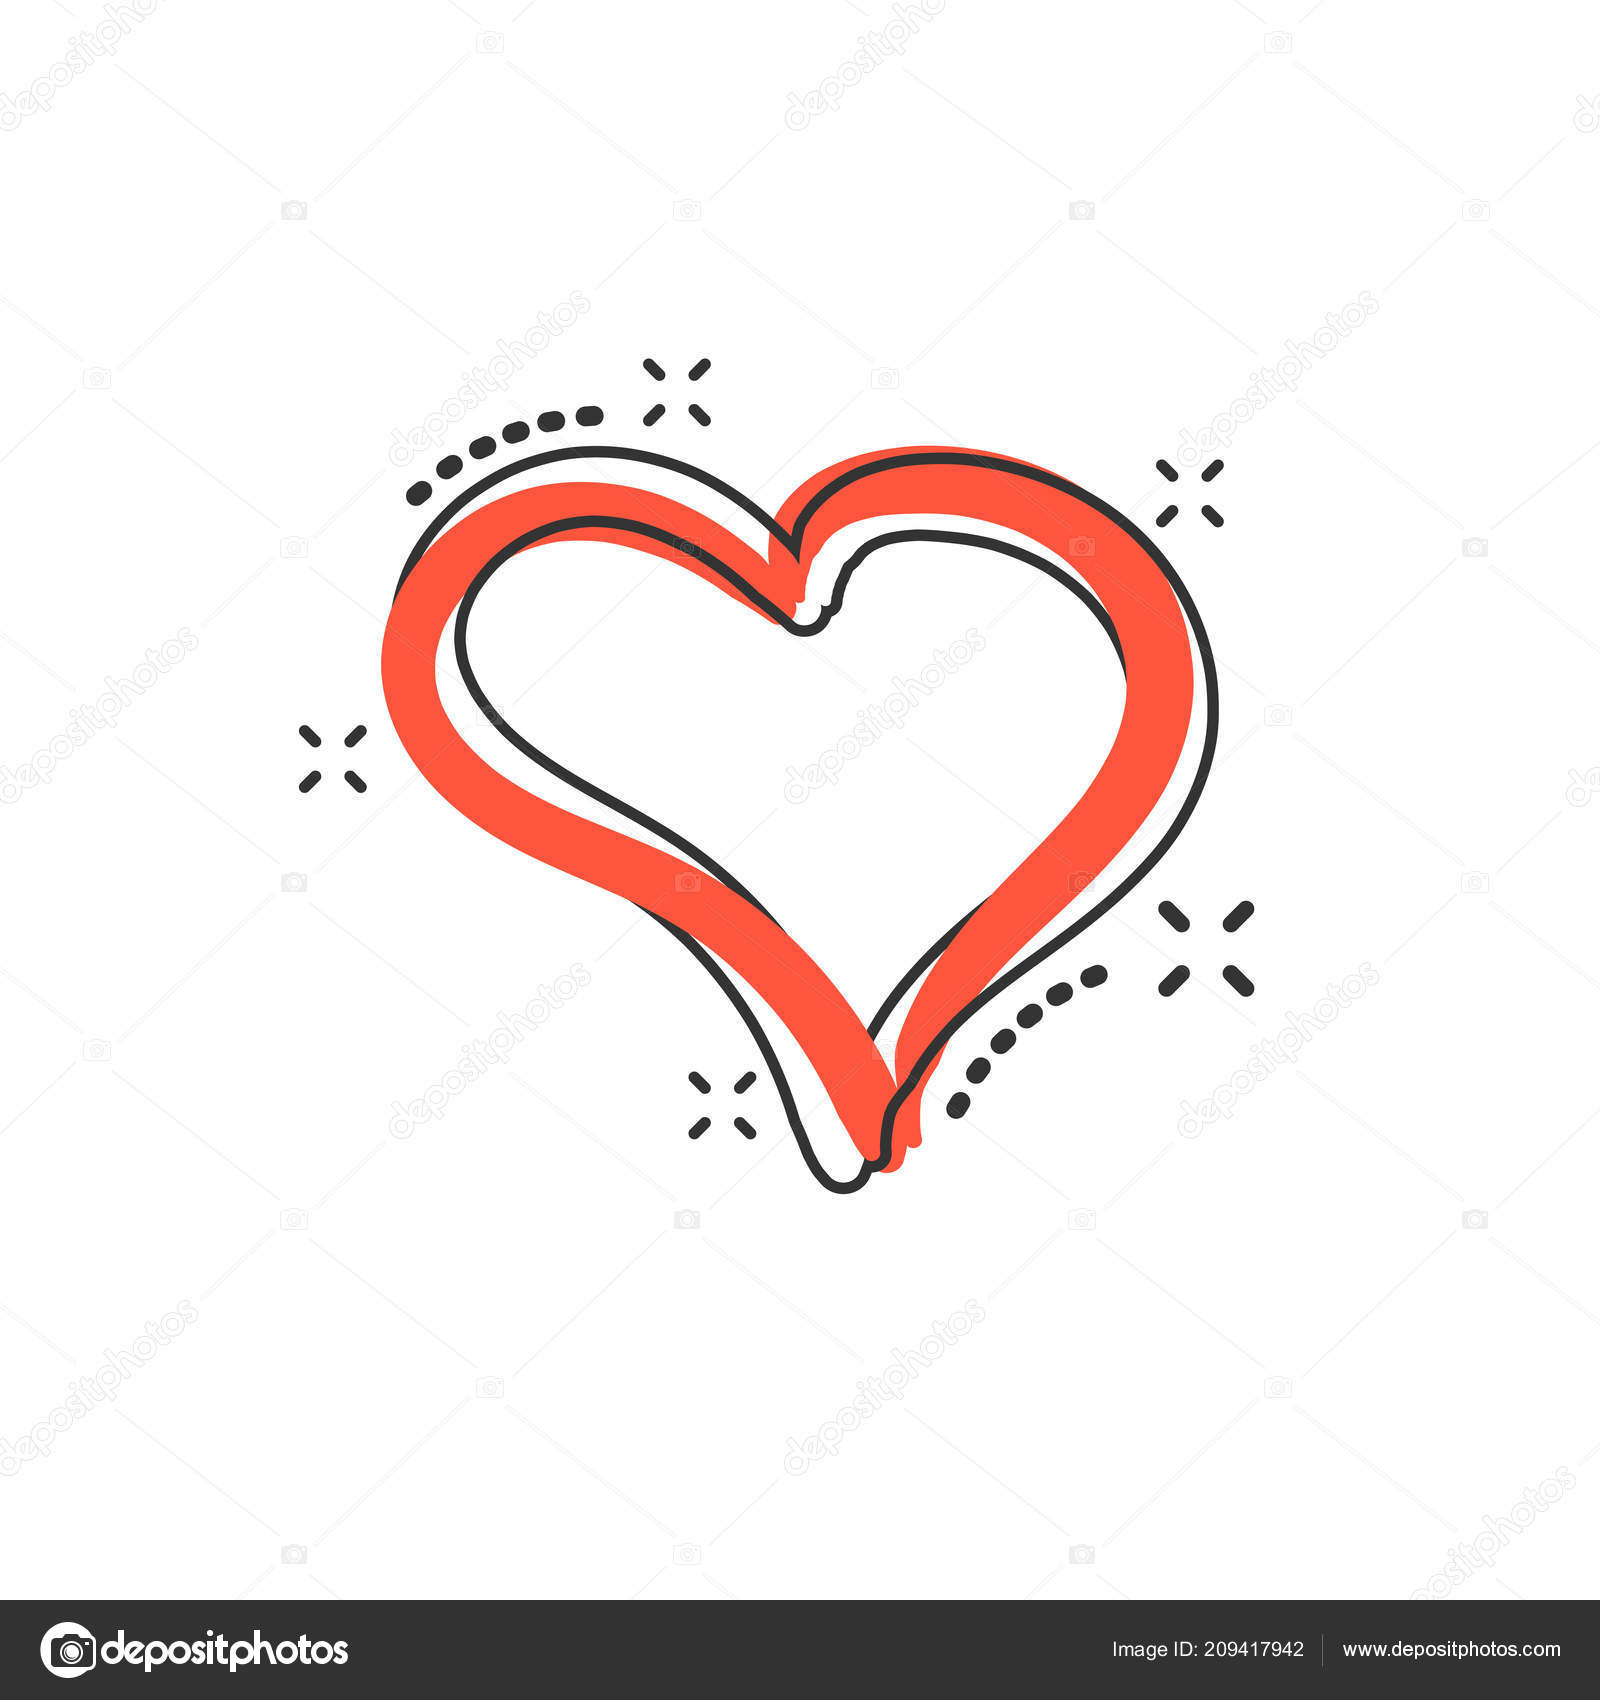 Vektor Kreslene Rukou Nakreslene Srdce Ikony Komicke Stylu Laska